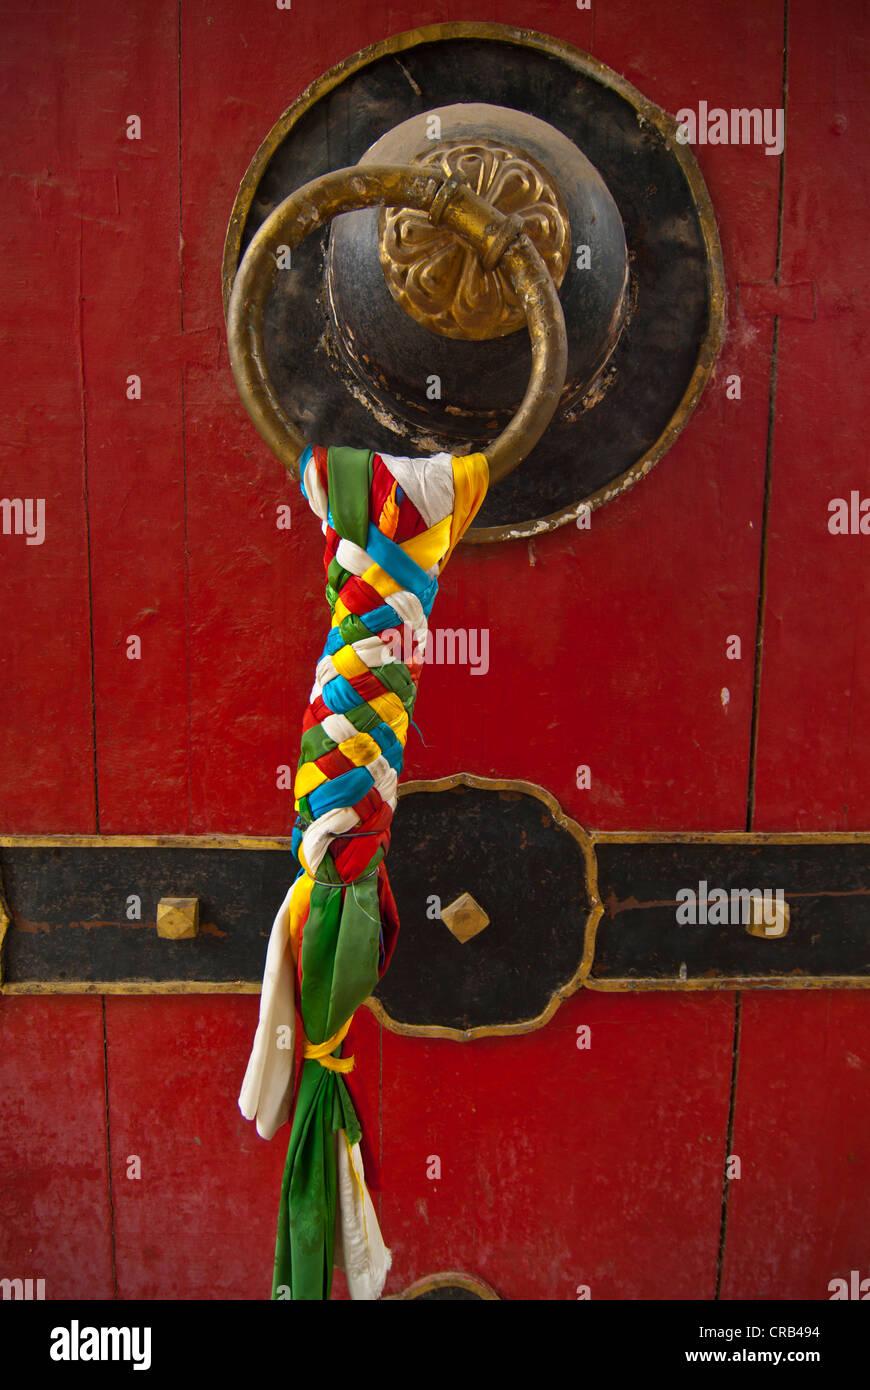 Tibetan door knob, Norbulingka Summer Palace, UNESCO World Heritage Site, Lhasa, Tibet, Asia - Stock Image